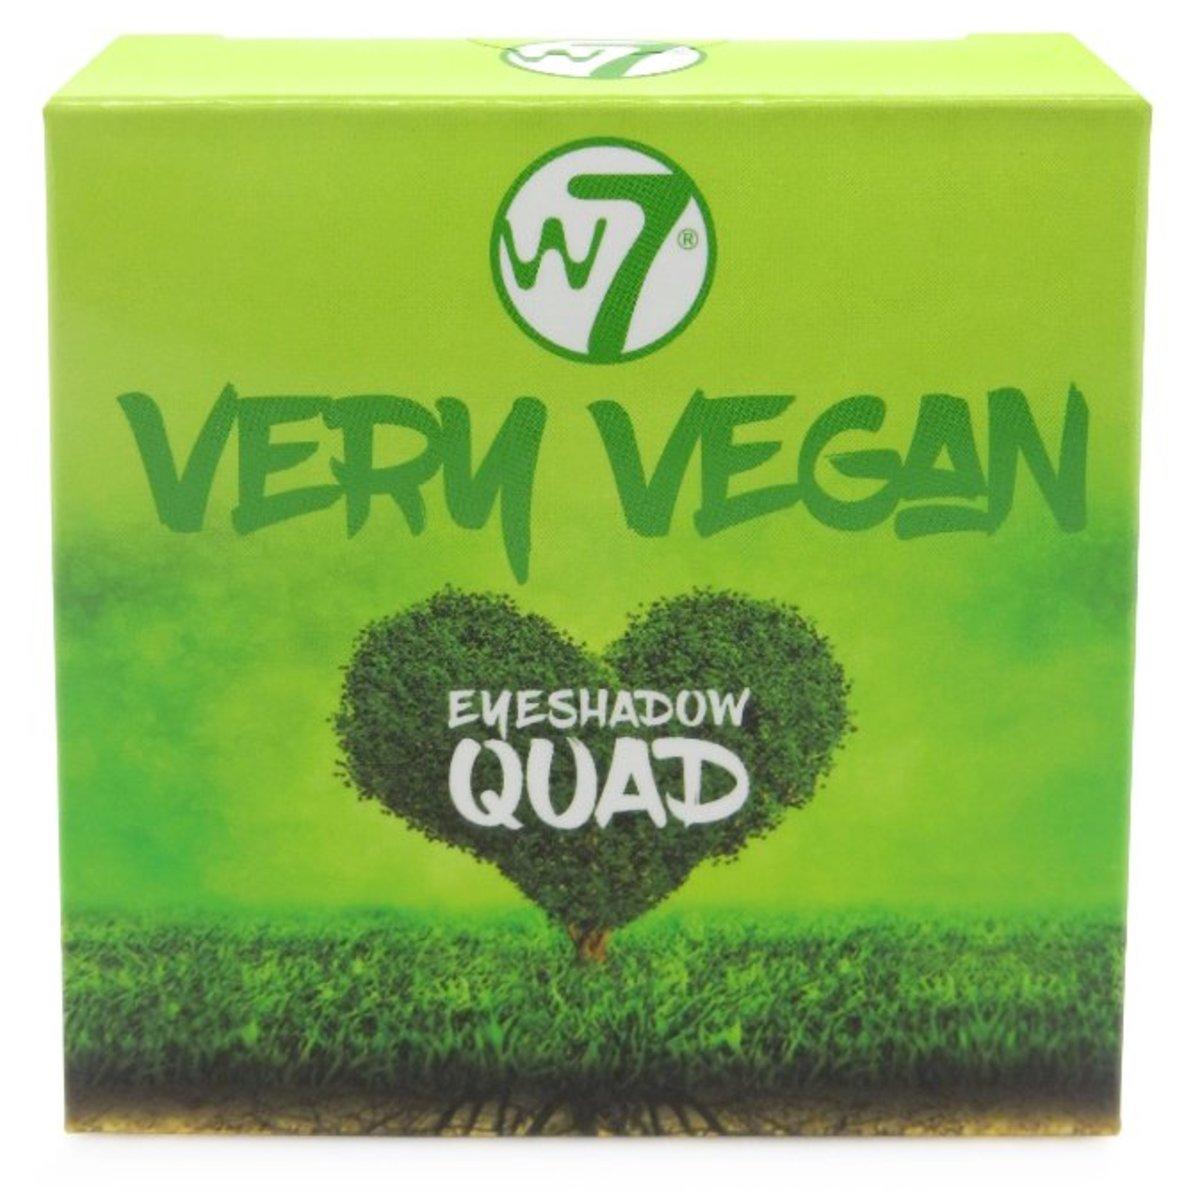 Very Vegan Eyeshadow Quad - Autumn Ambers